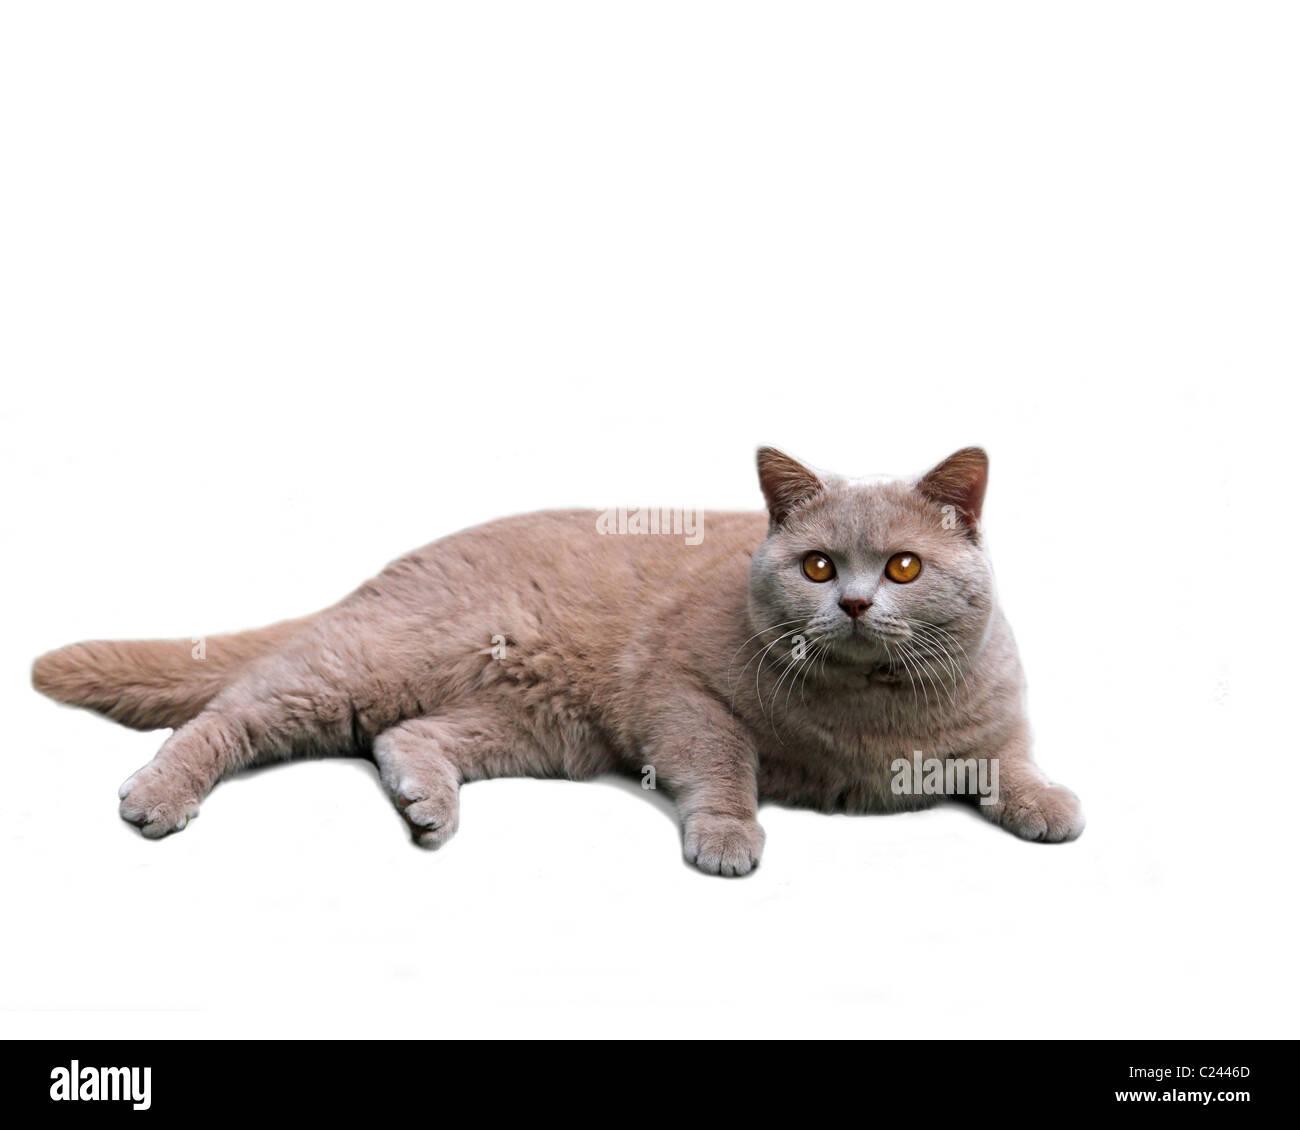 british shorthair cat on white background - Stock Image